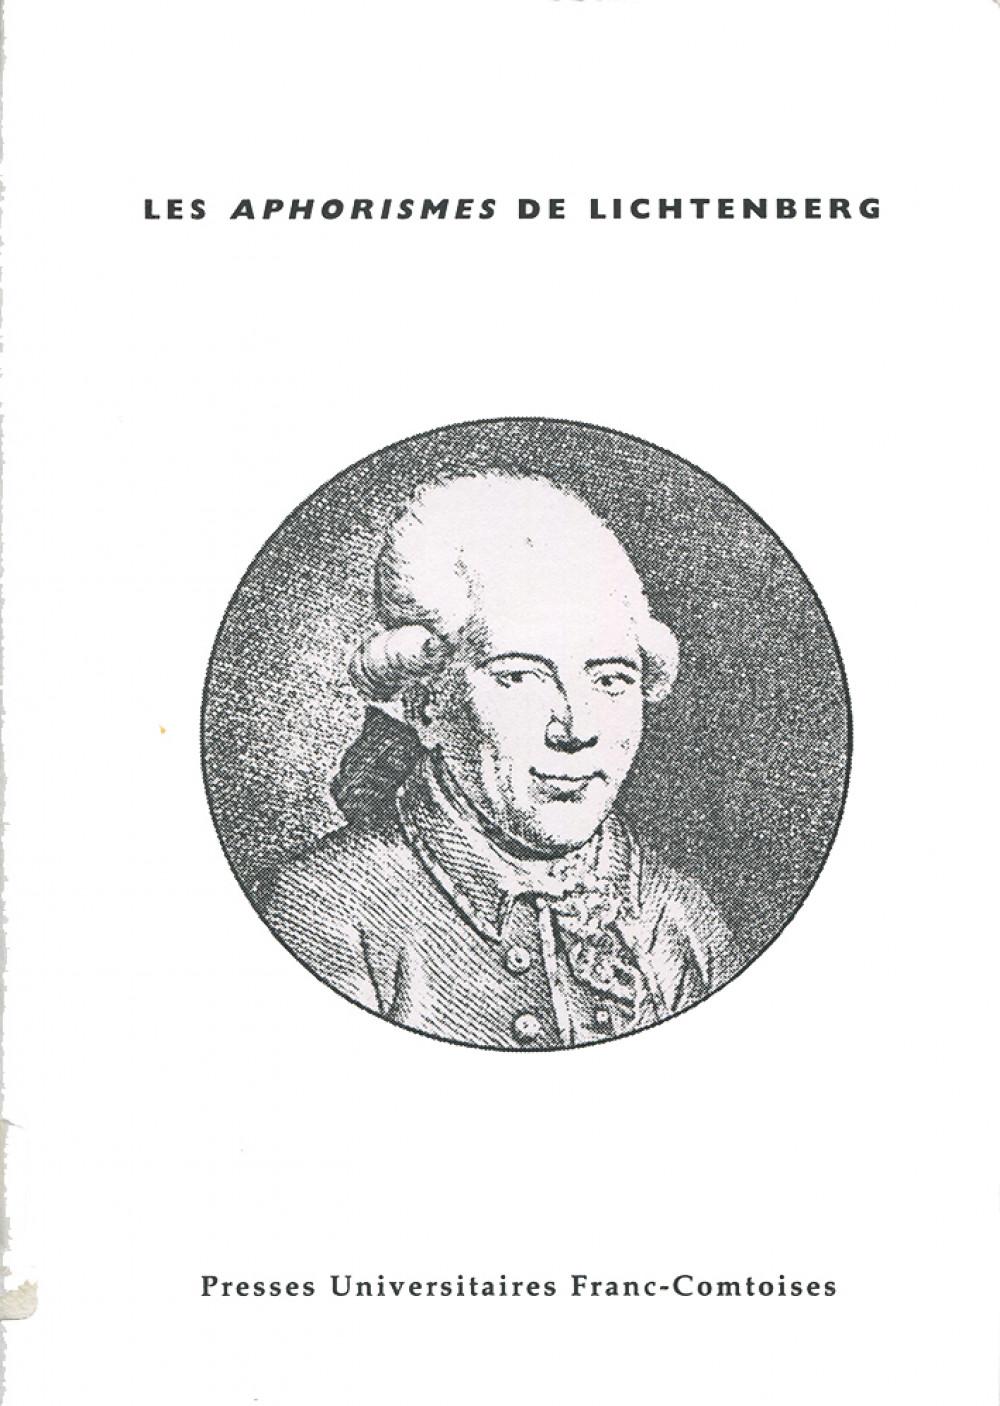 Les <em>Aphorismes</em> de Lichtenberg